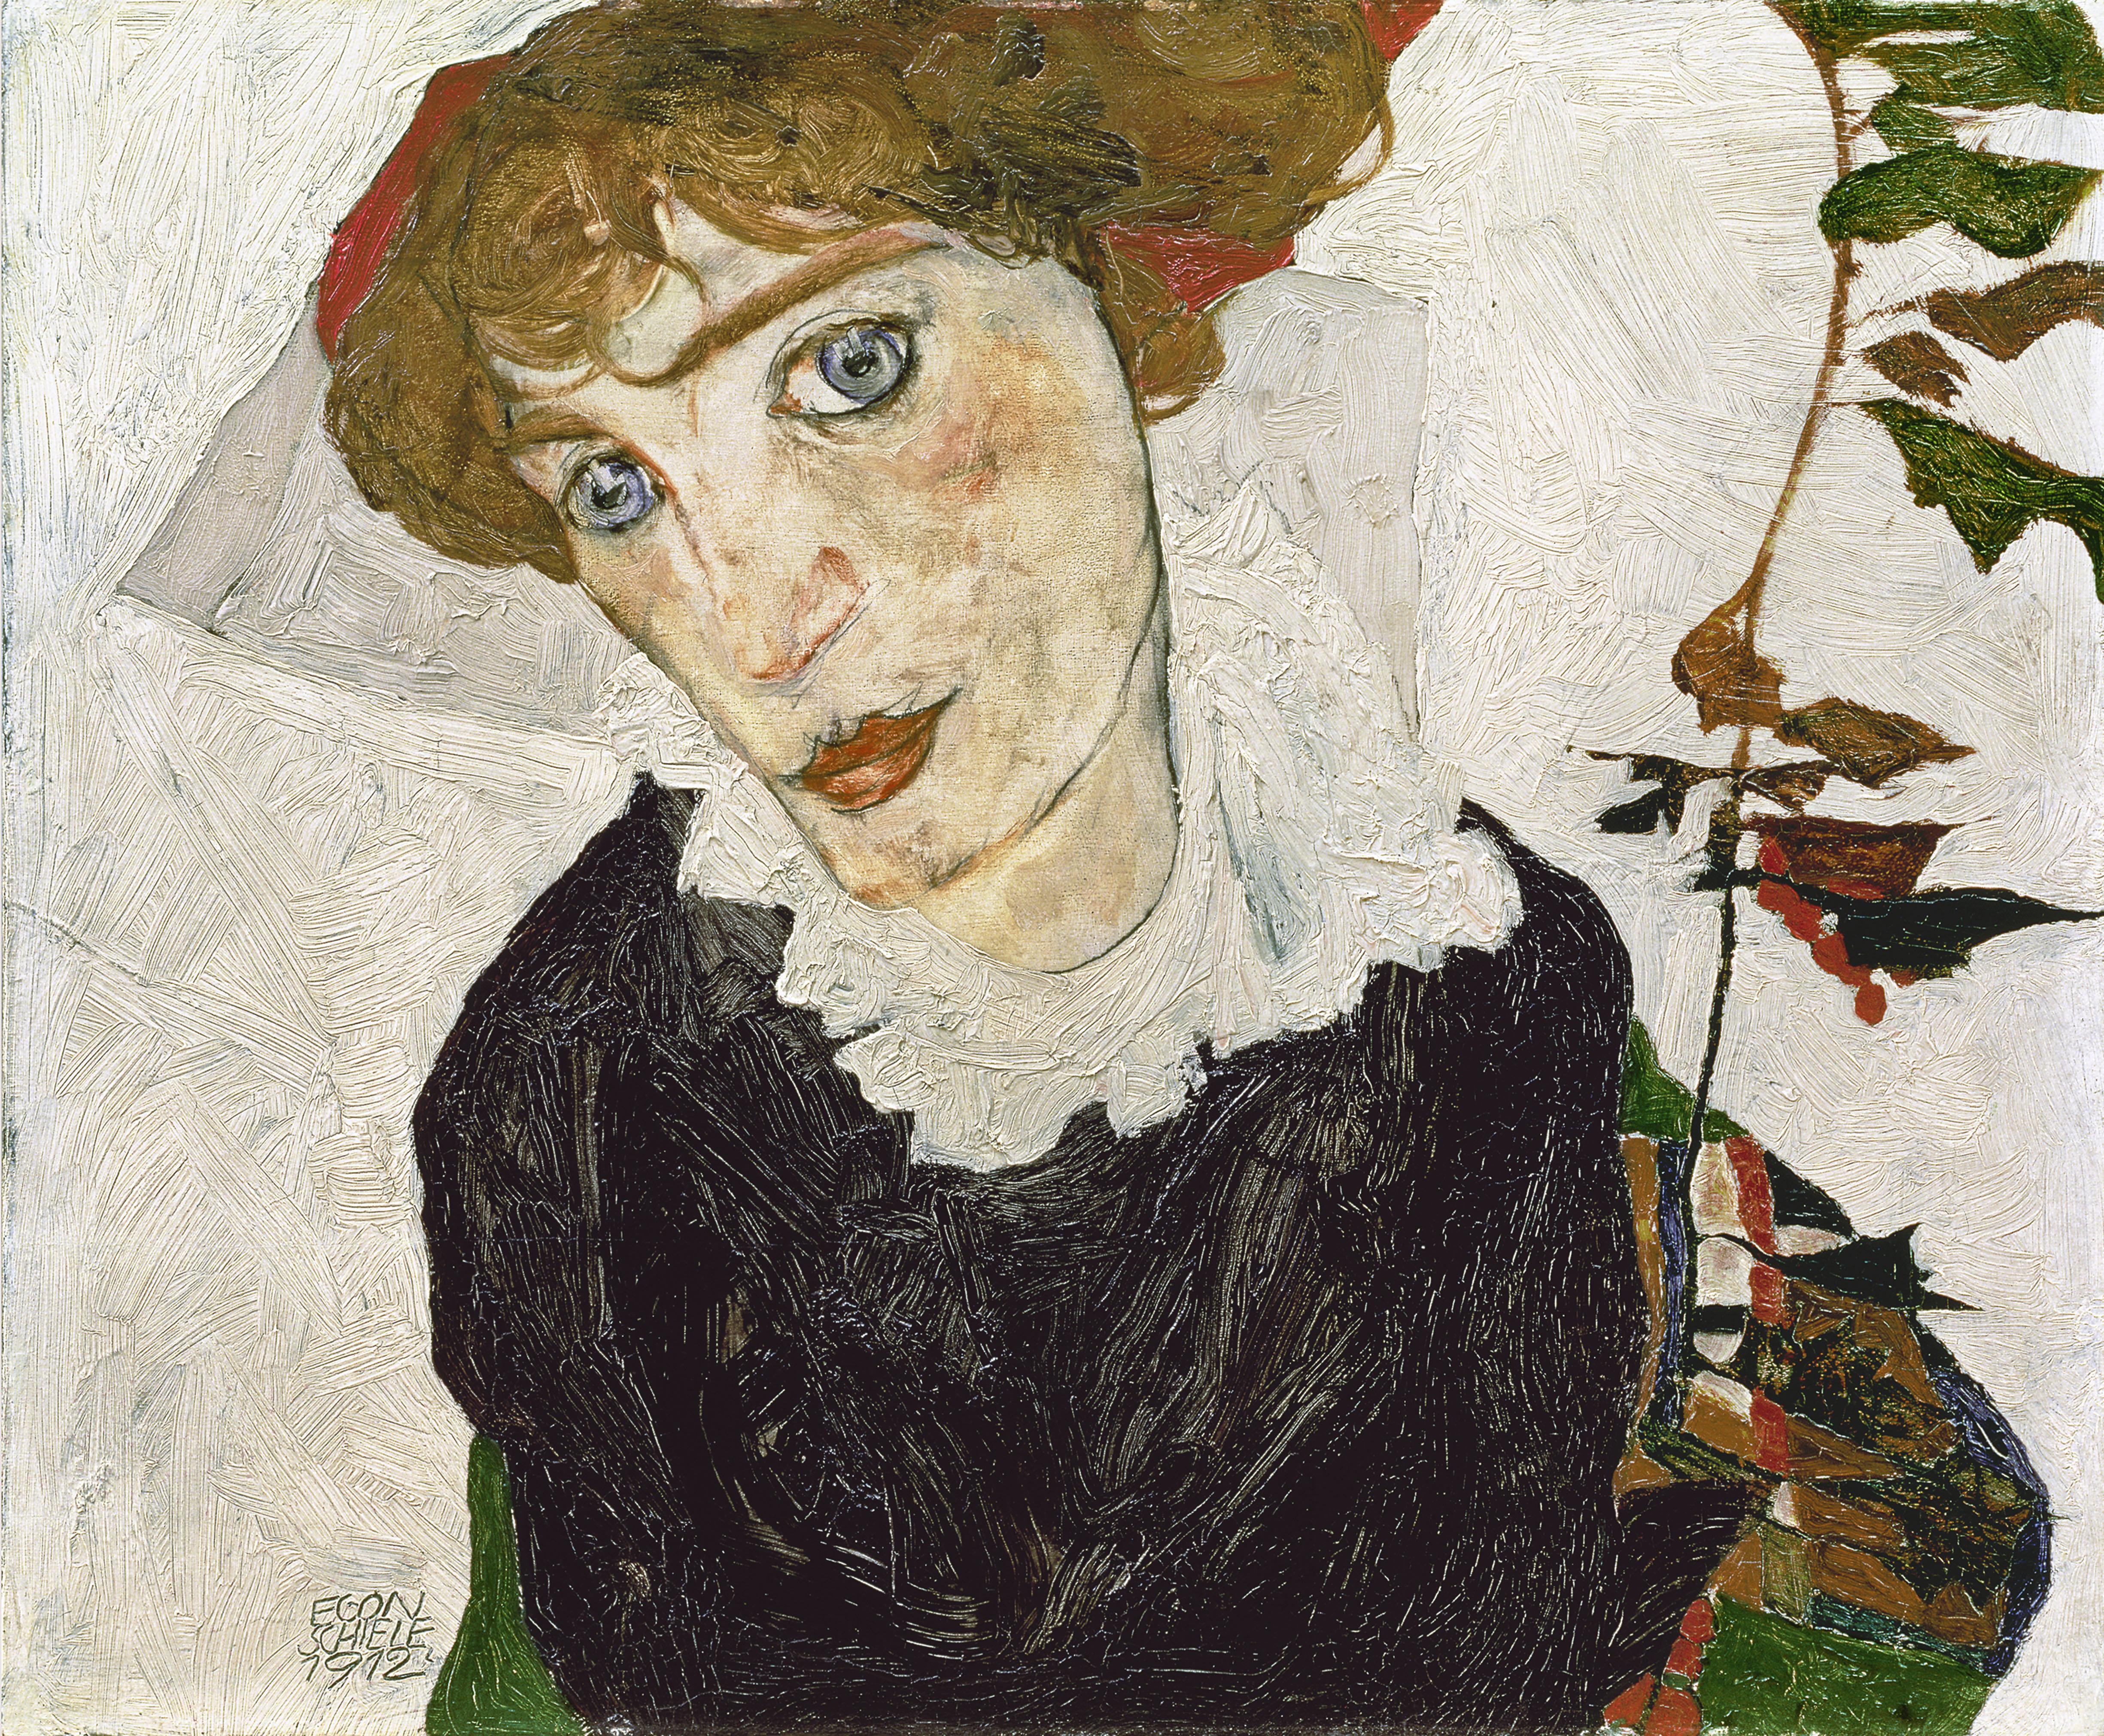 Schiele Potrait de Wally Neuzil 1912 Leopold Museum, Vienne.